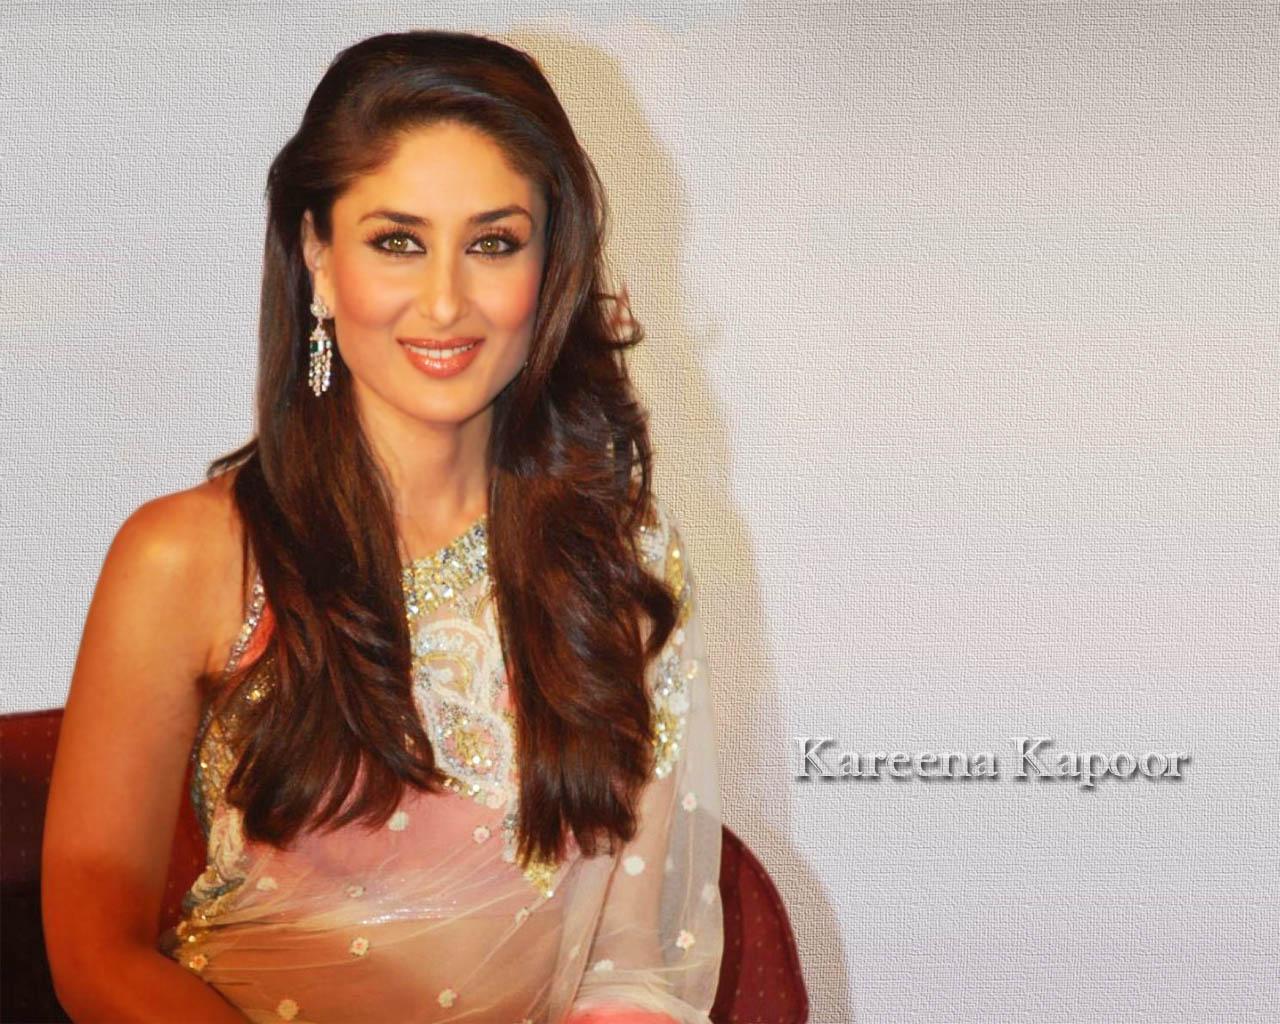 Karina Kapoor Hot-Photo Of Kareena  Top Hollywood Actress-5520